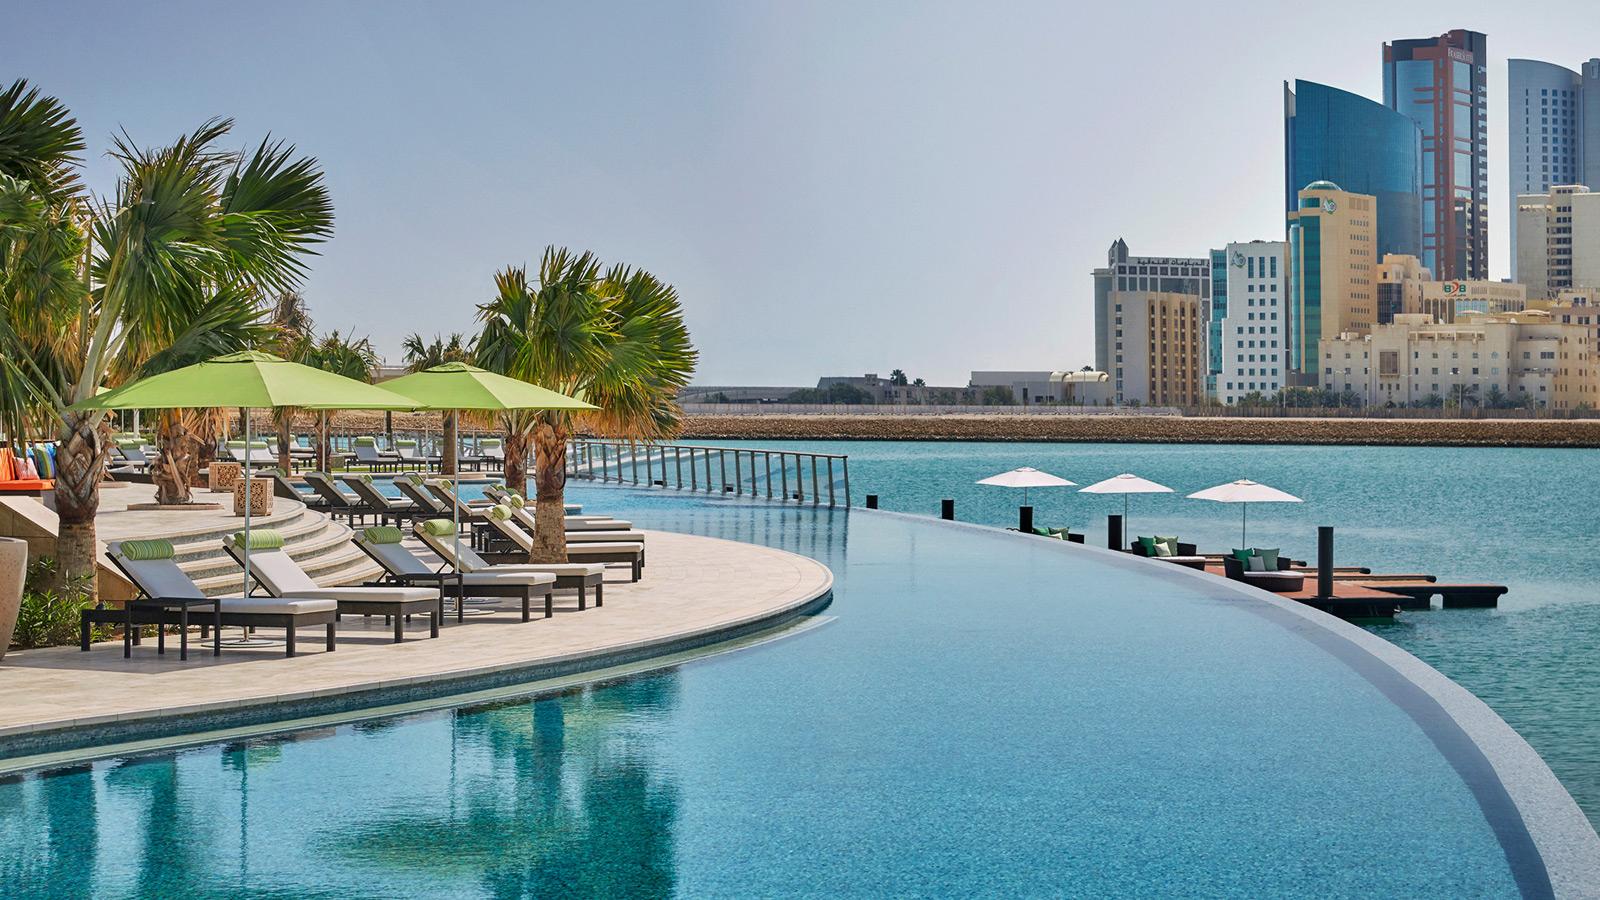 Hotels In Bahrain Luxury Hotel Four Seasons Hotel